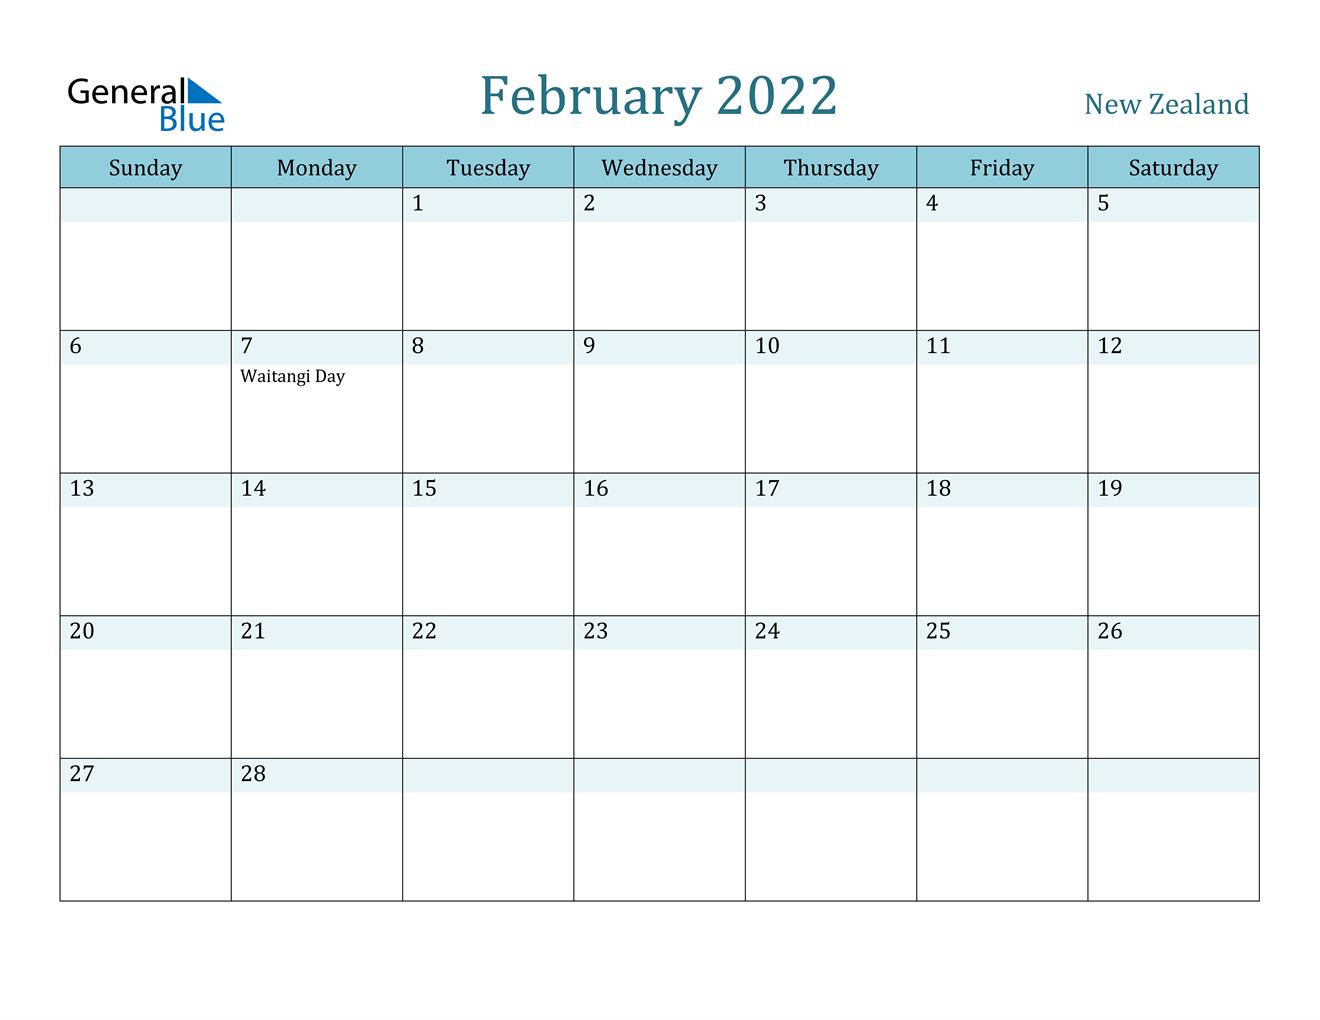 February 2022 Calendar - New Zealand Throughout February 2022 Calendar Printable